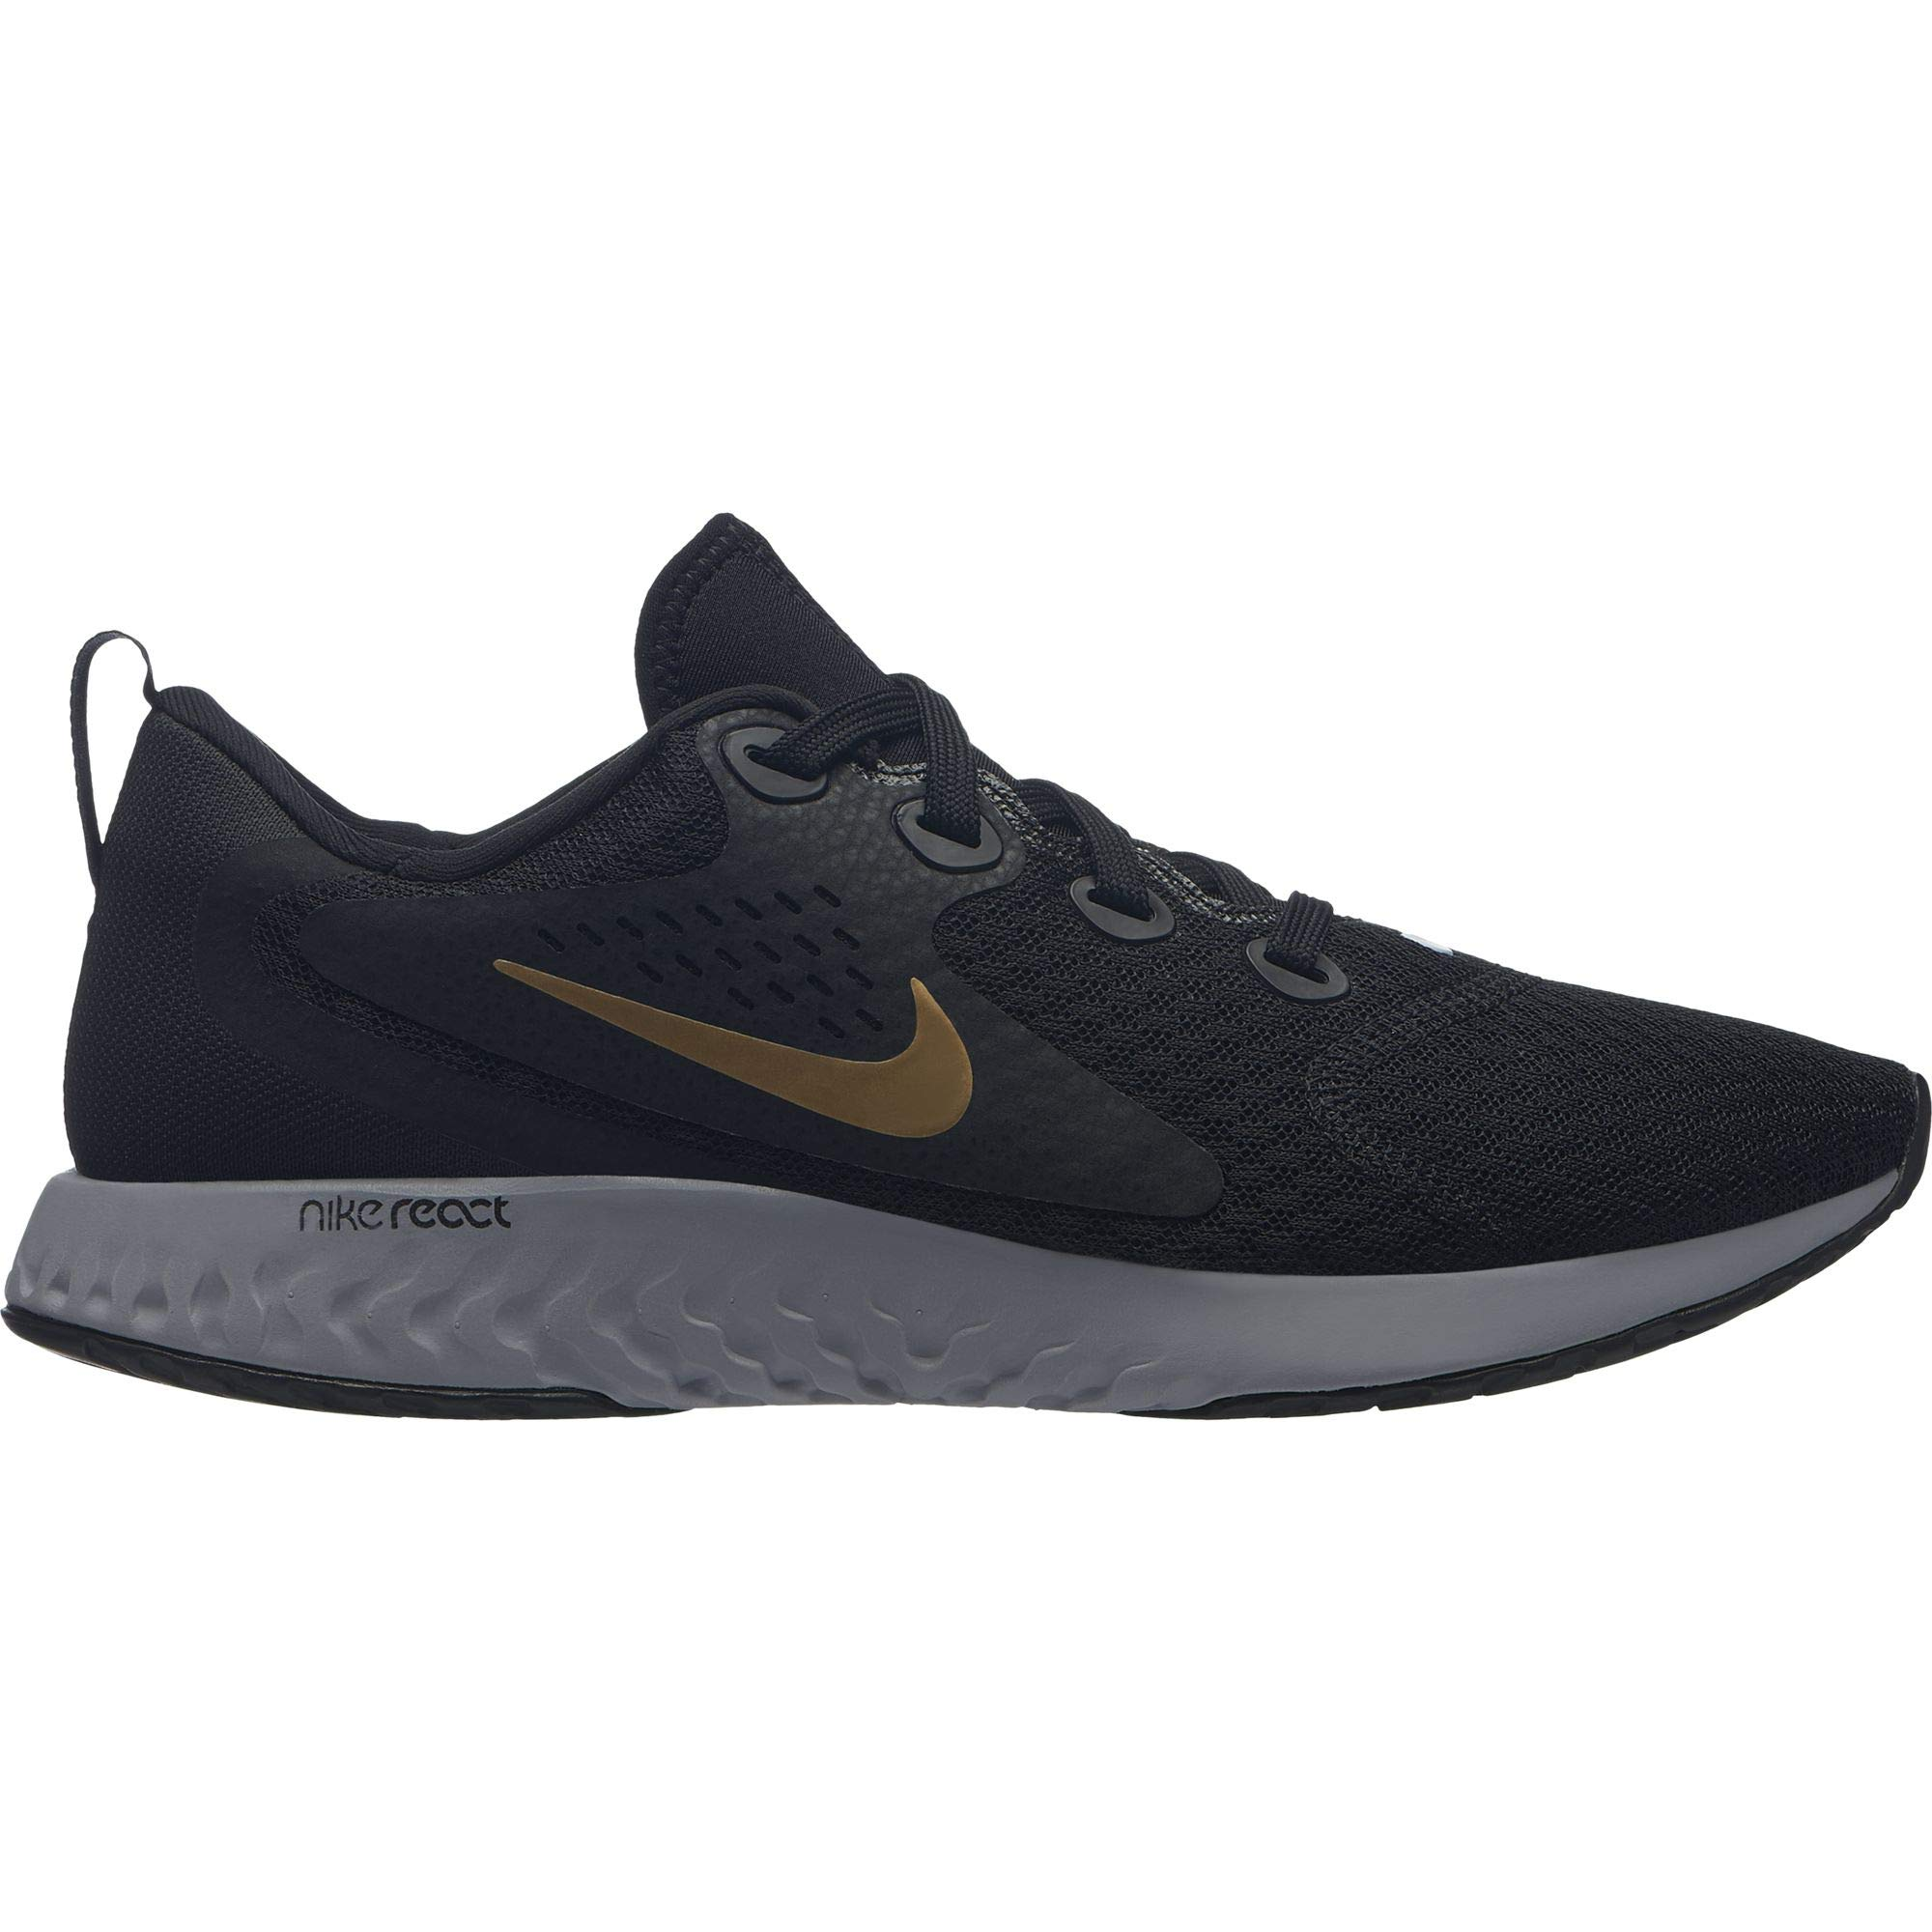 e9dd90467f49 Galleon - Nike Women s Legend React Running Shoes